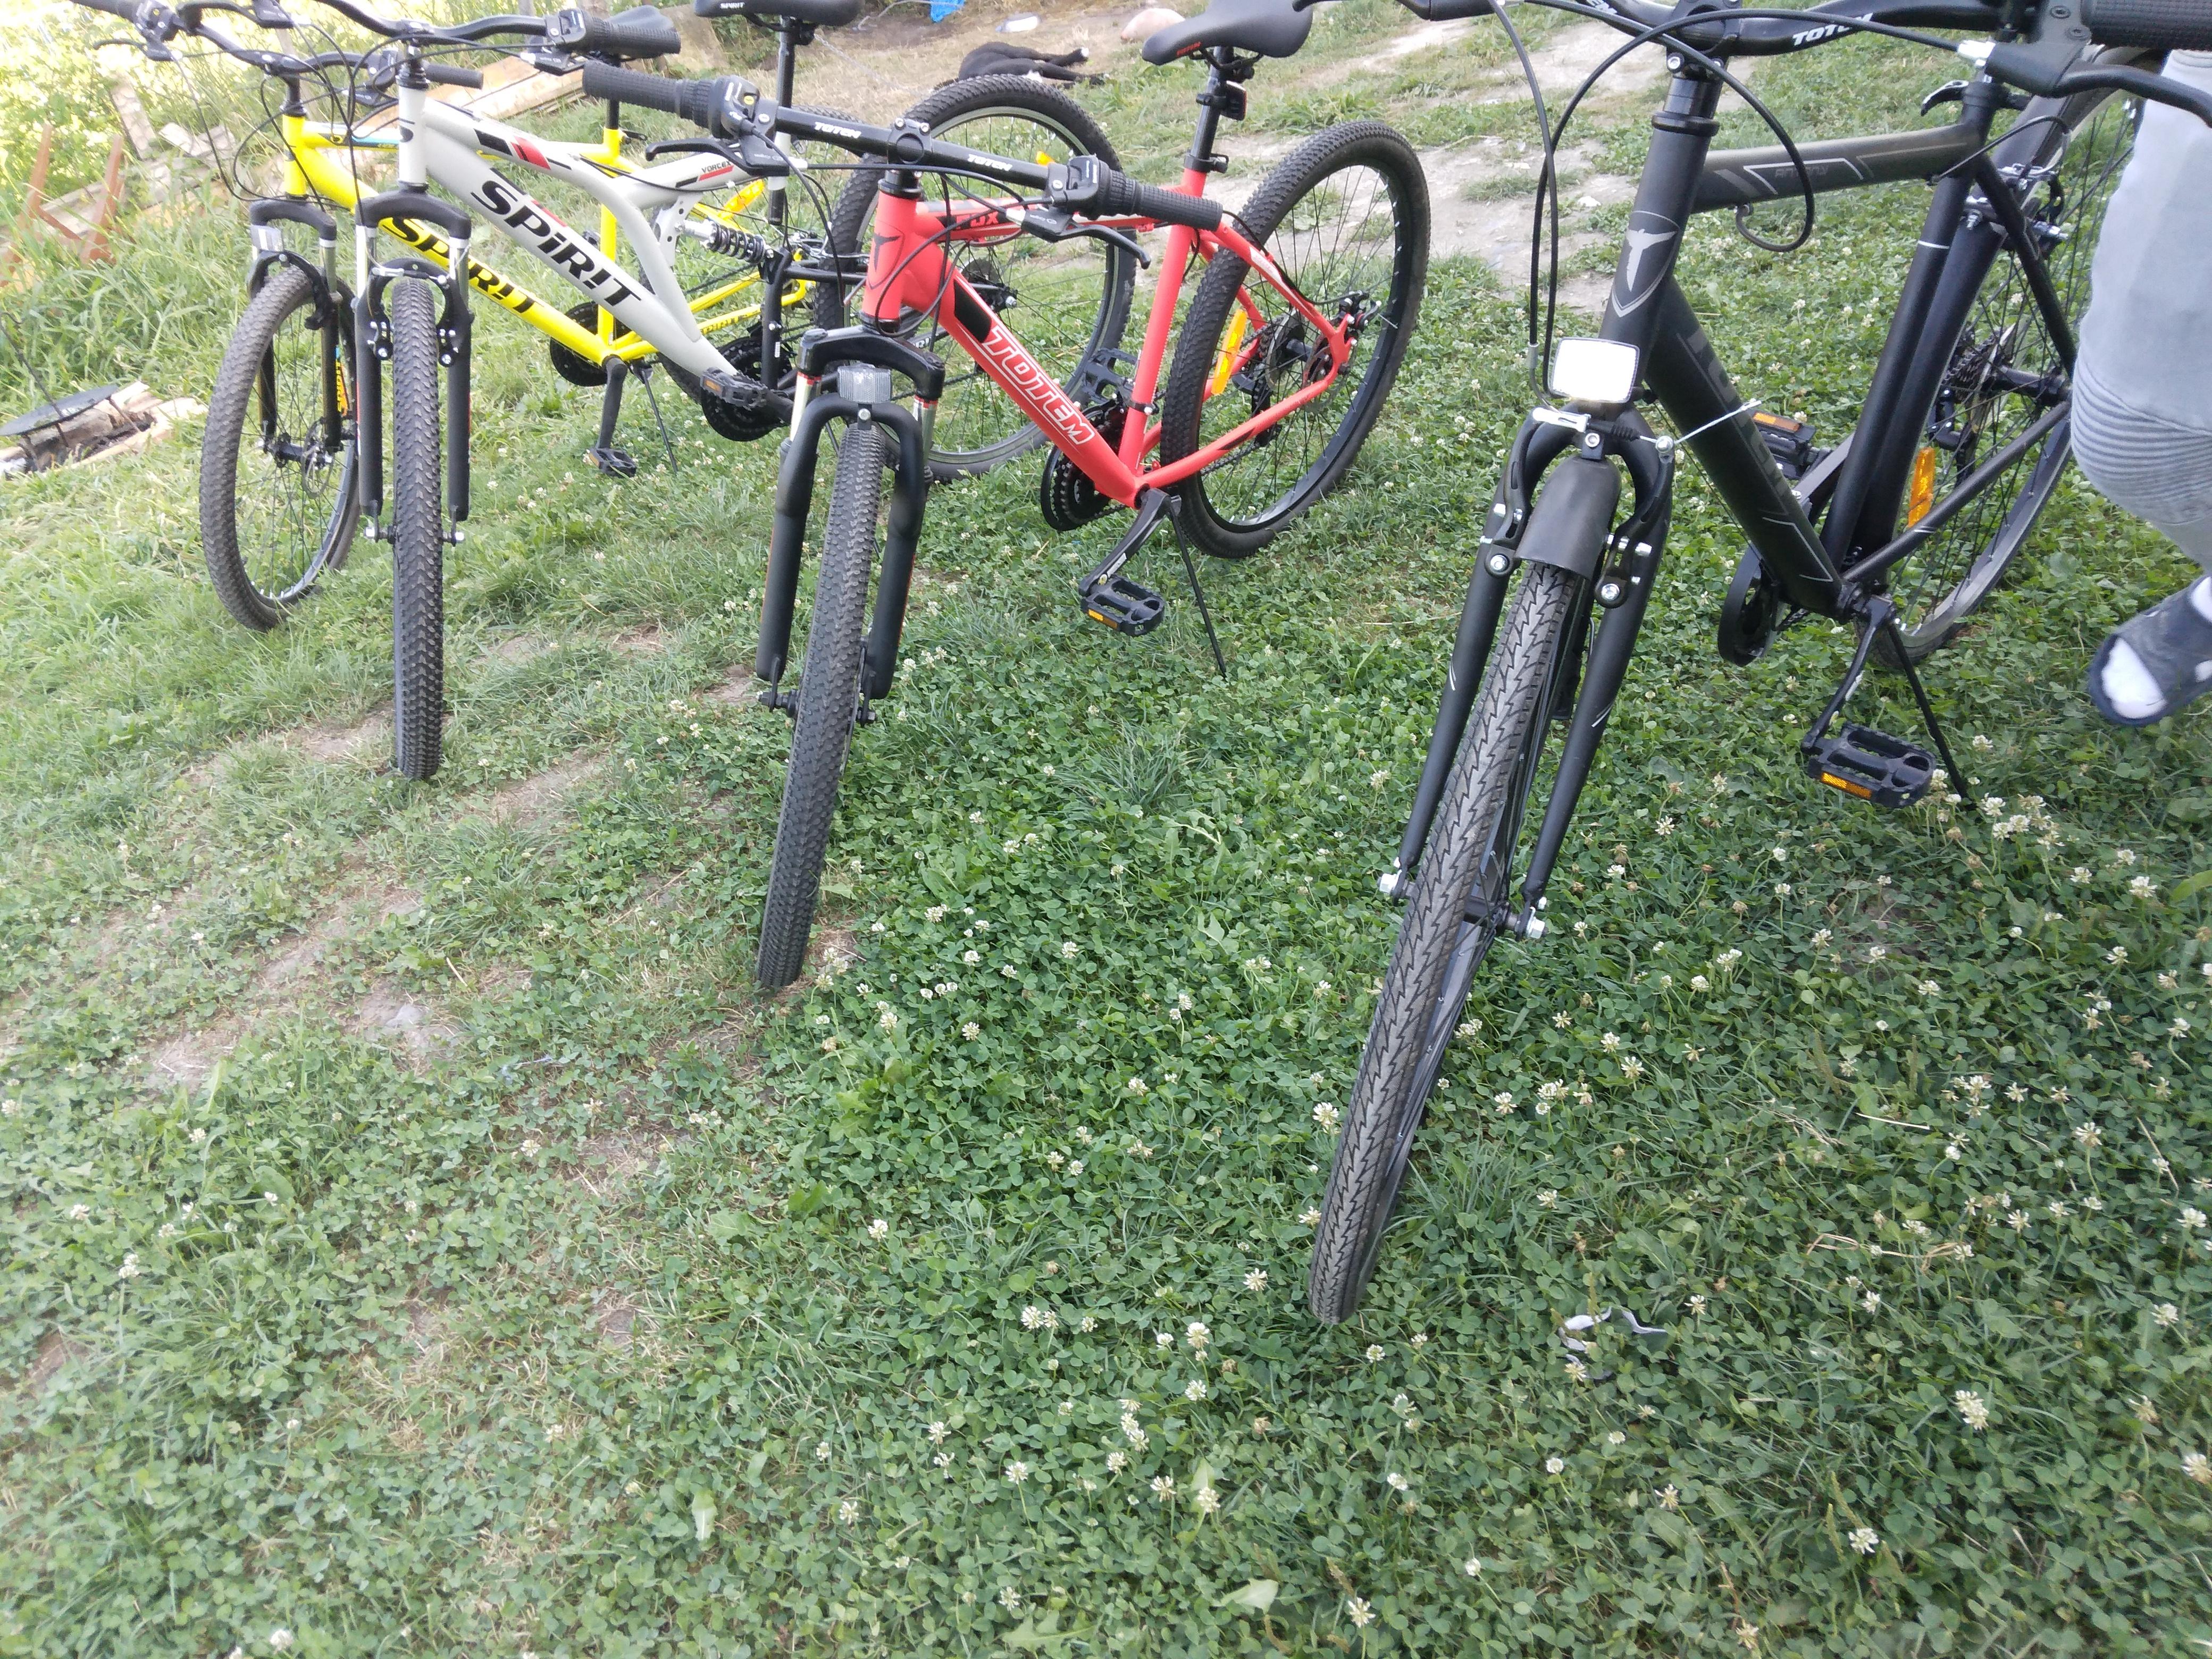 Eladó vadonatúj Svájci biciklik